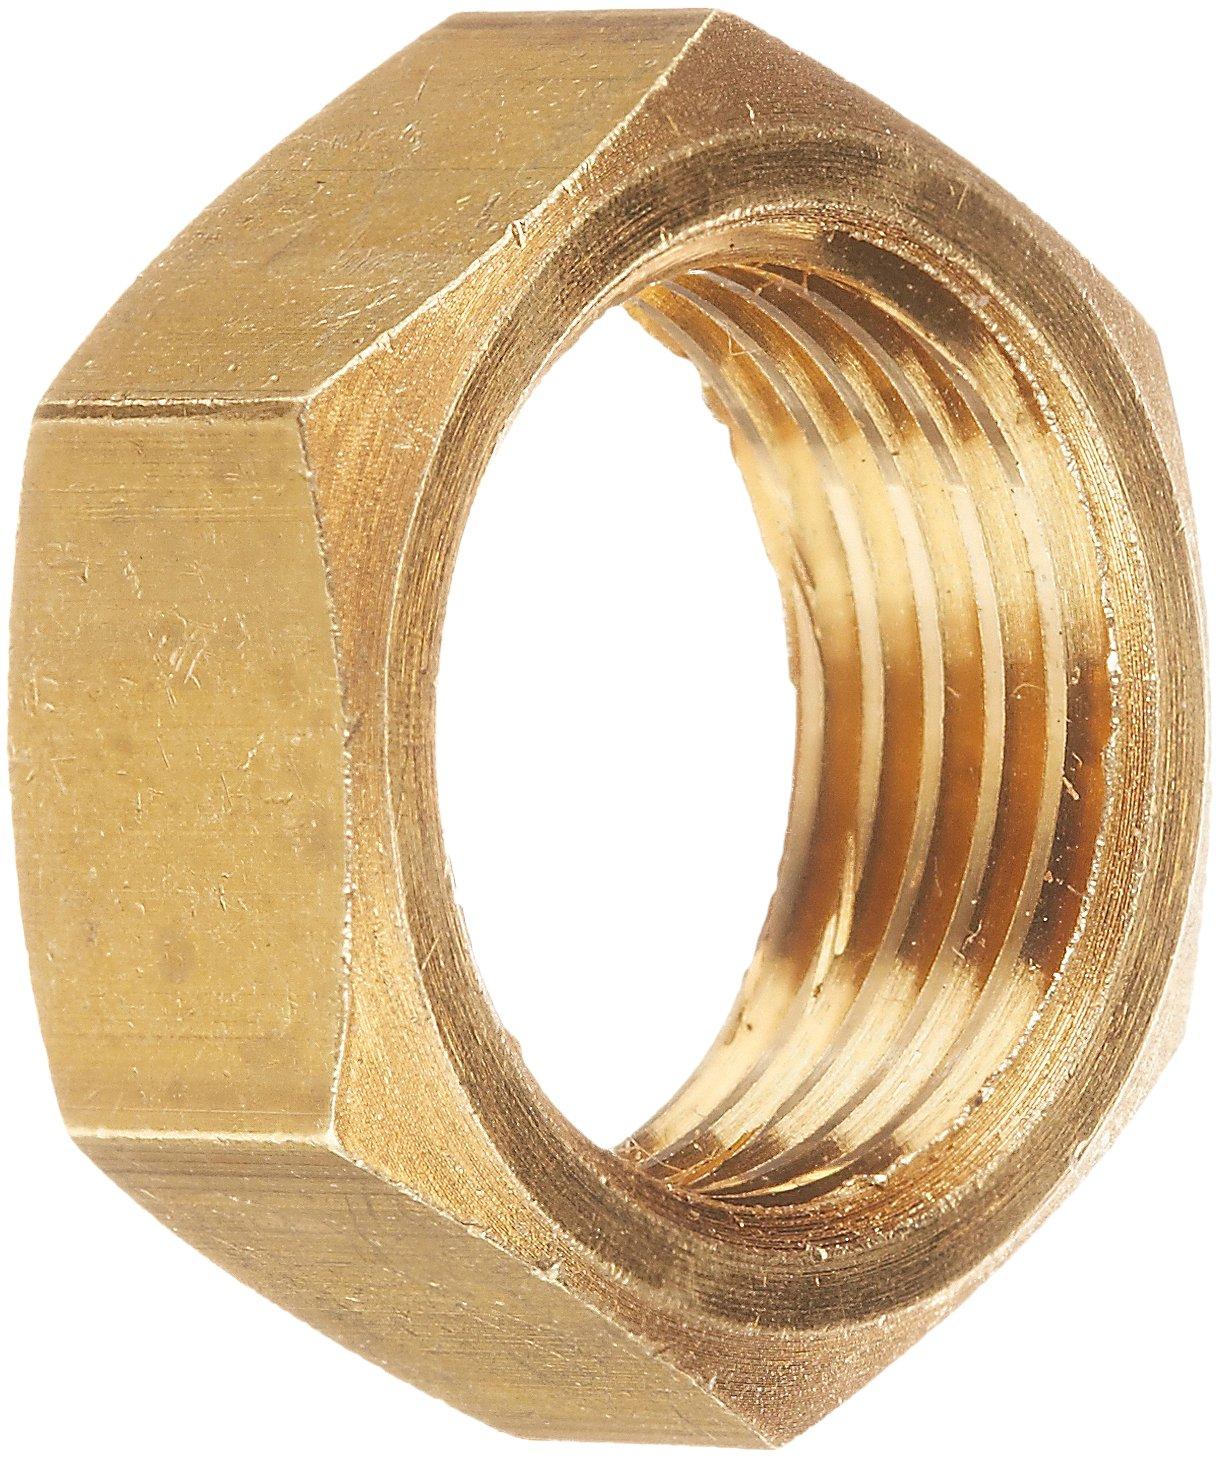 5//16 Tube OD CA360 Brass EATON Weatherhead 0102X5 Bulkhead Nut